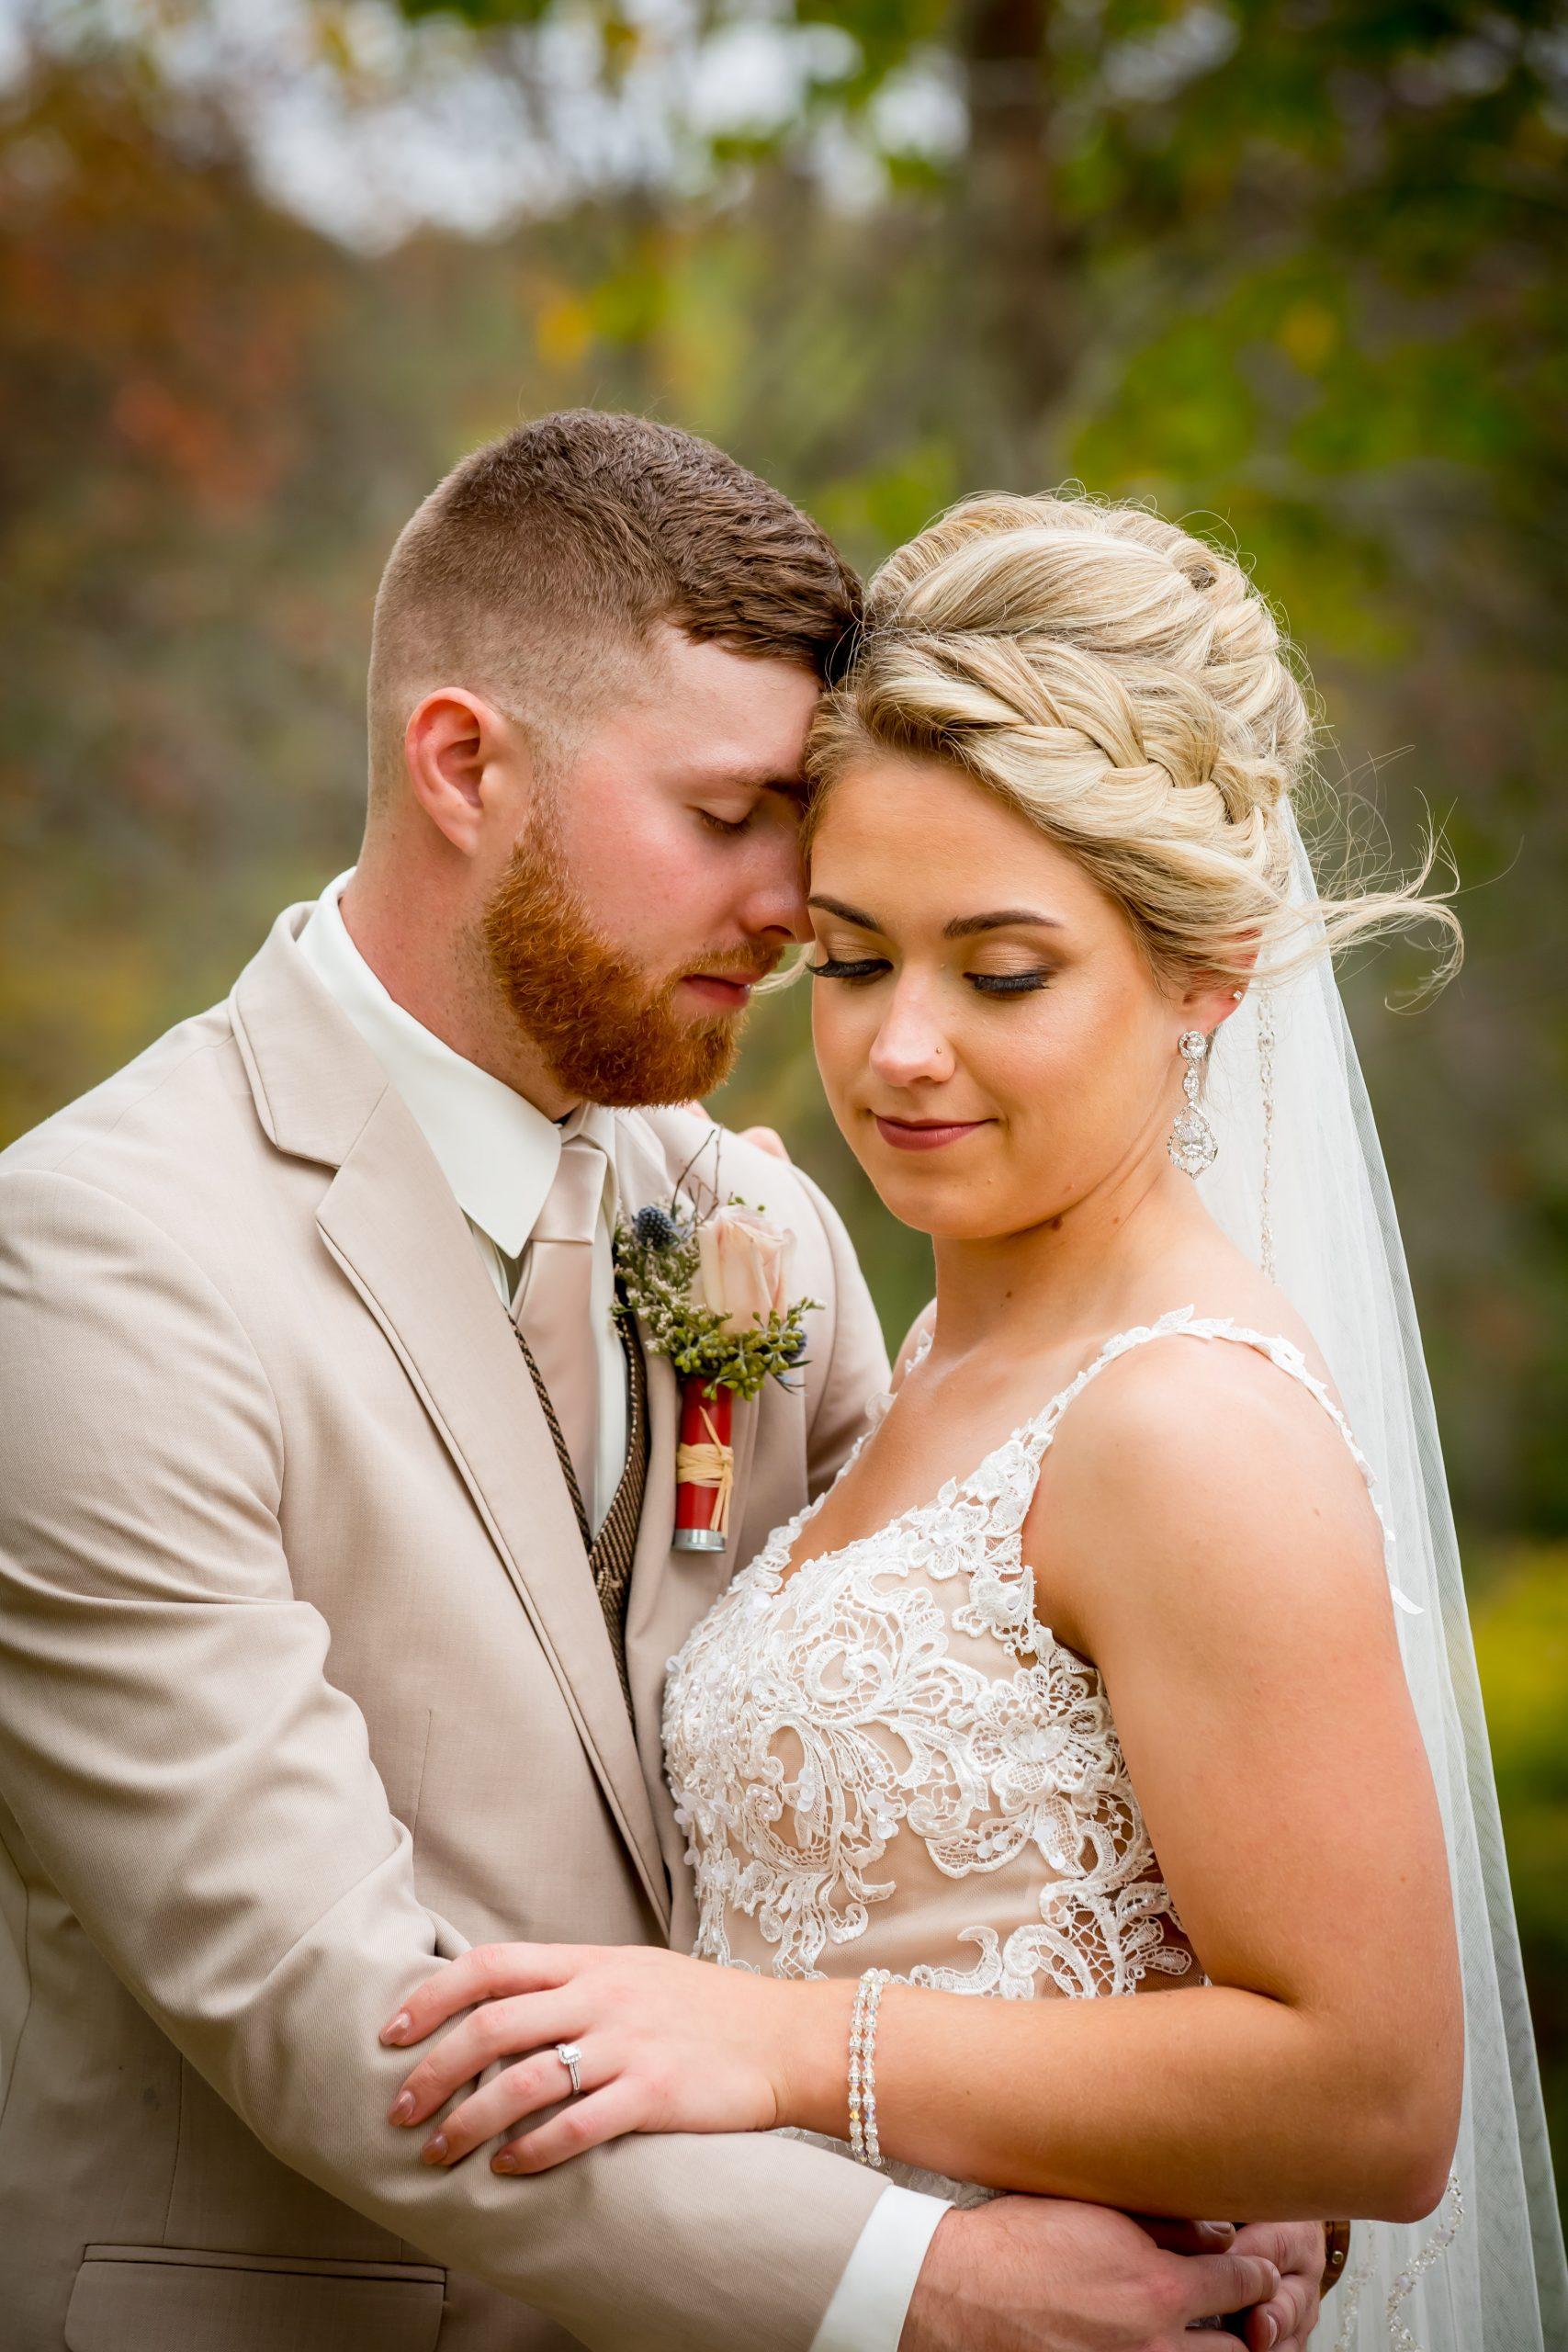 liberty_ridge_wedding11.jpg